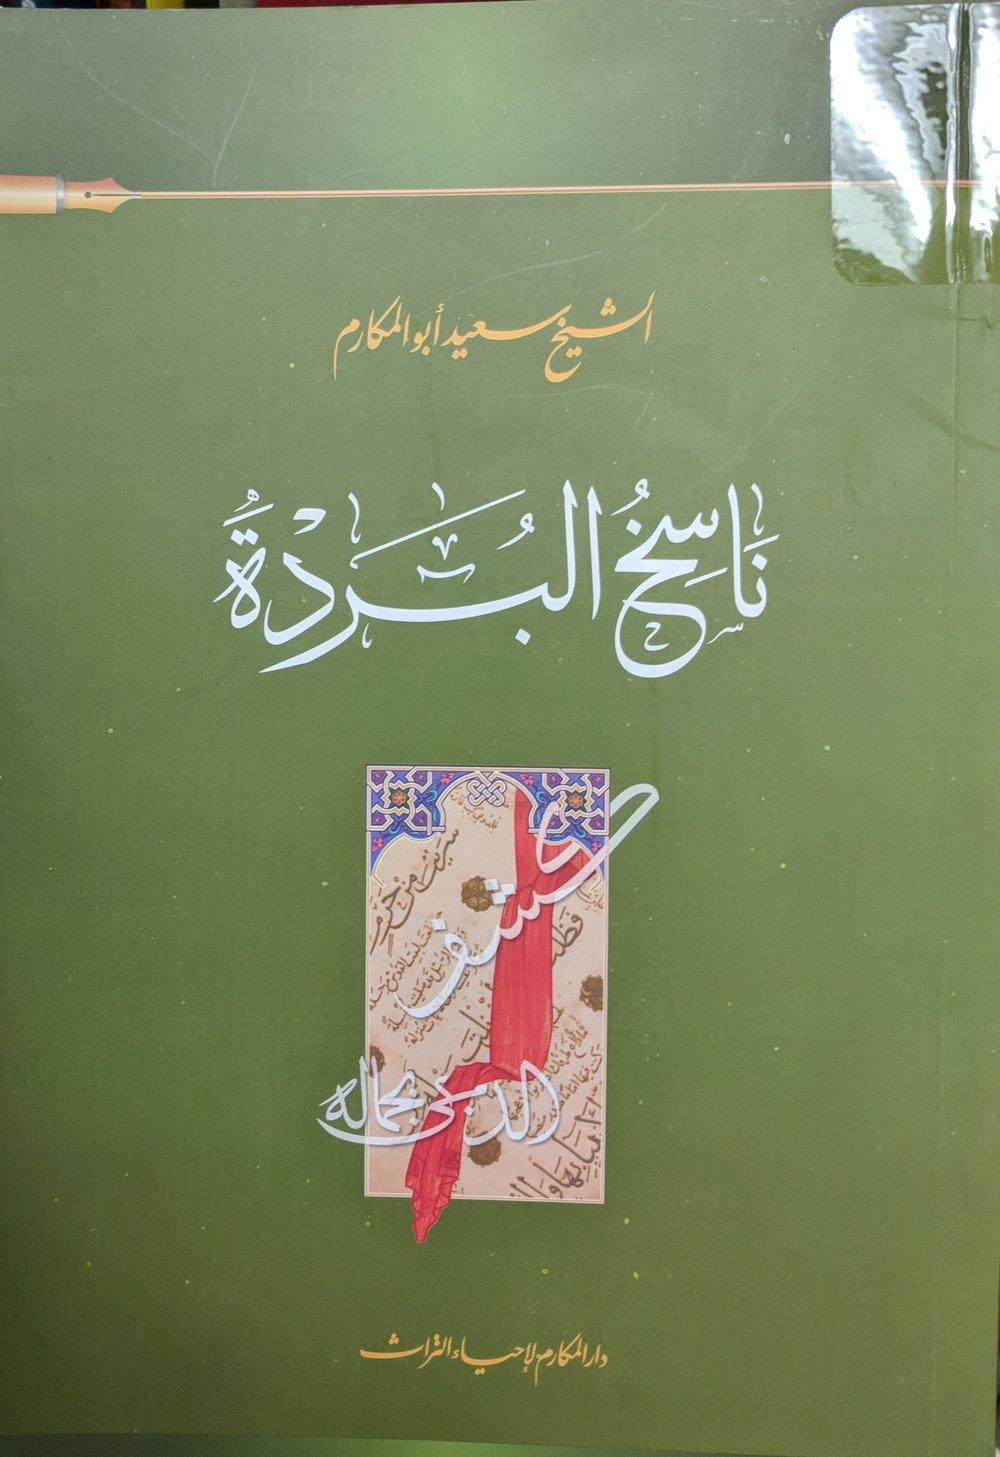 Saʻīd Abū al-Makāri, Nāsikh al-burdah  (Bayrūt: Dār al-Makārim li-Iḥyā' al-Turāth, 2007)